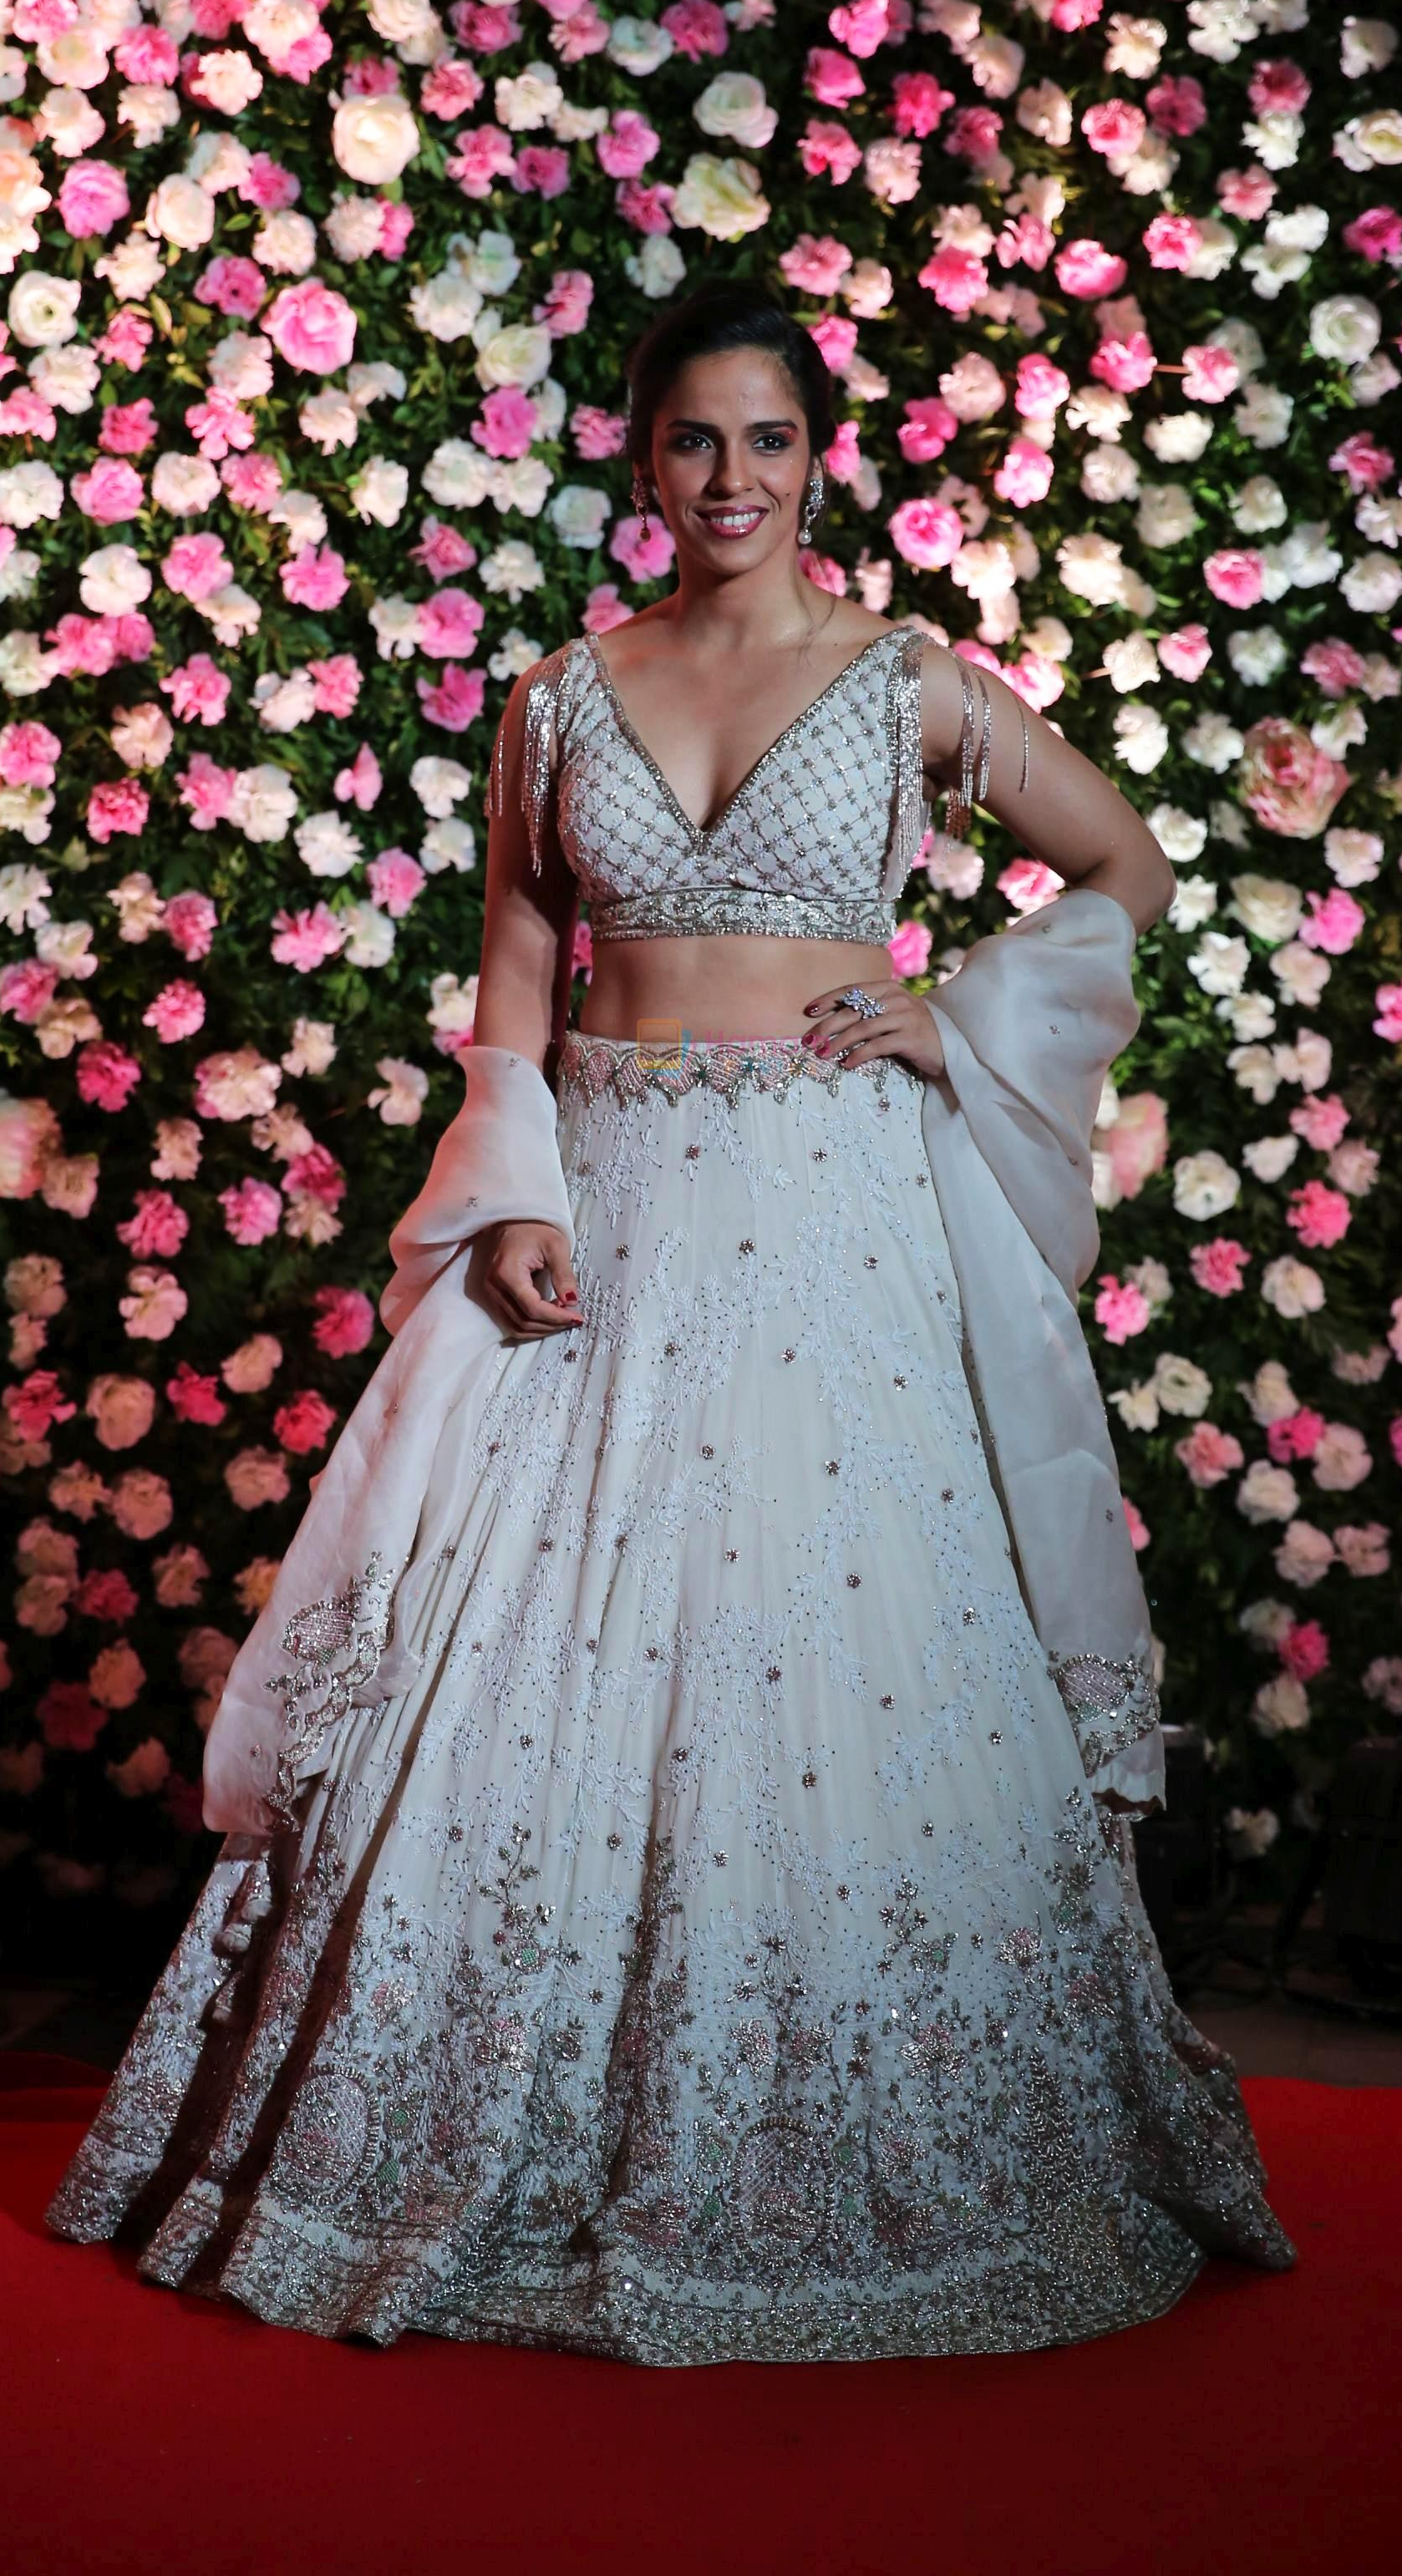 Saina Nehwal looked lovely in a white designer lehenga at